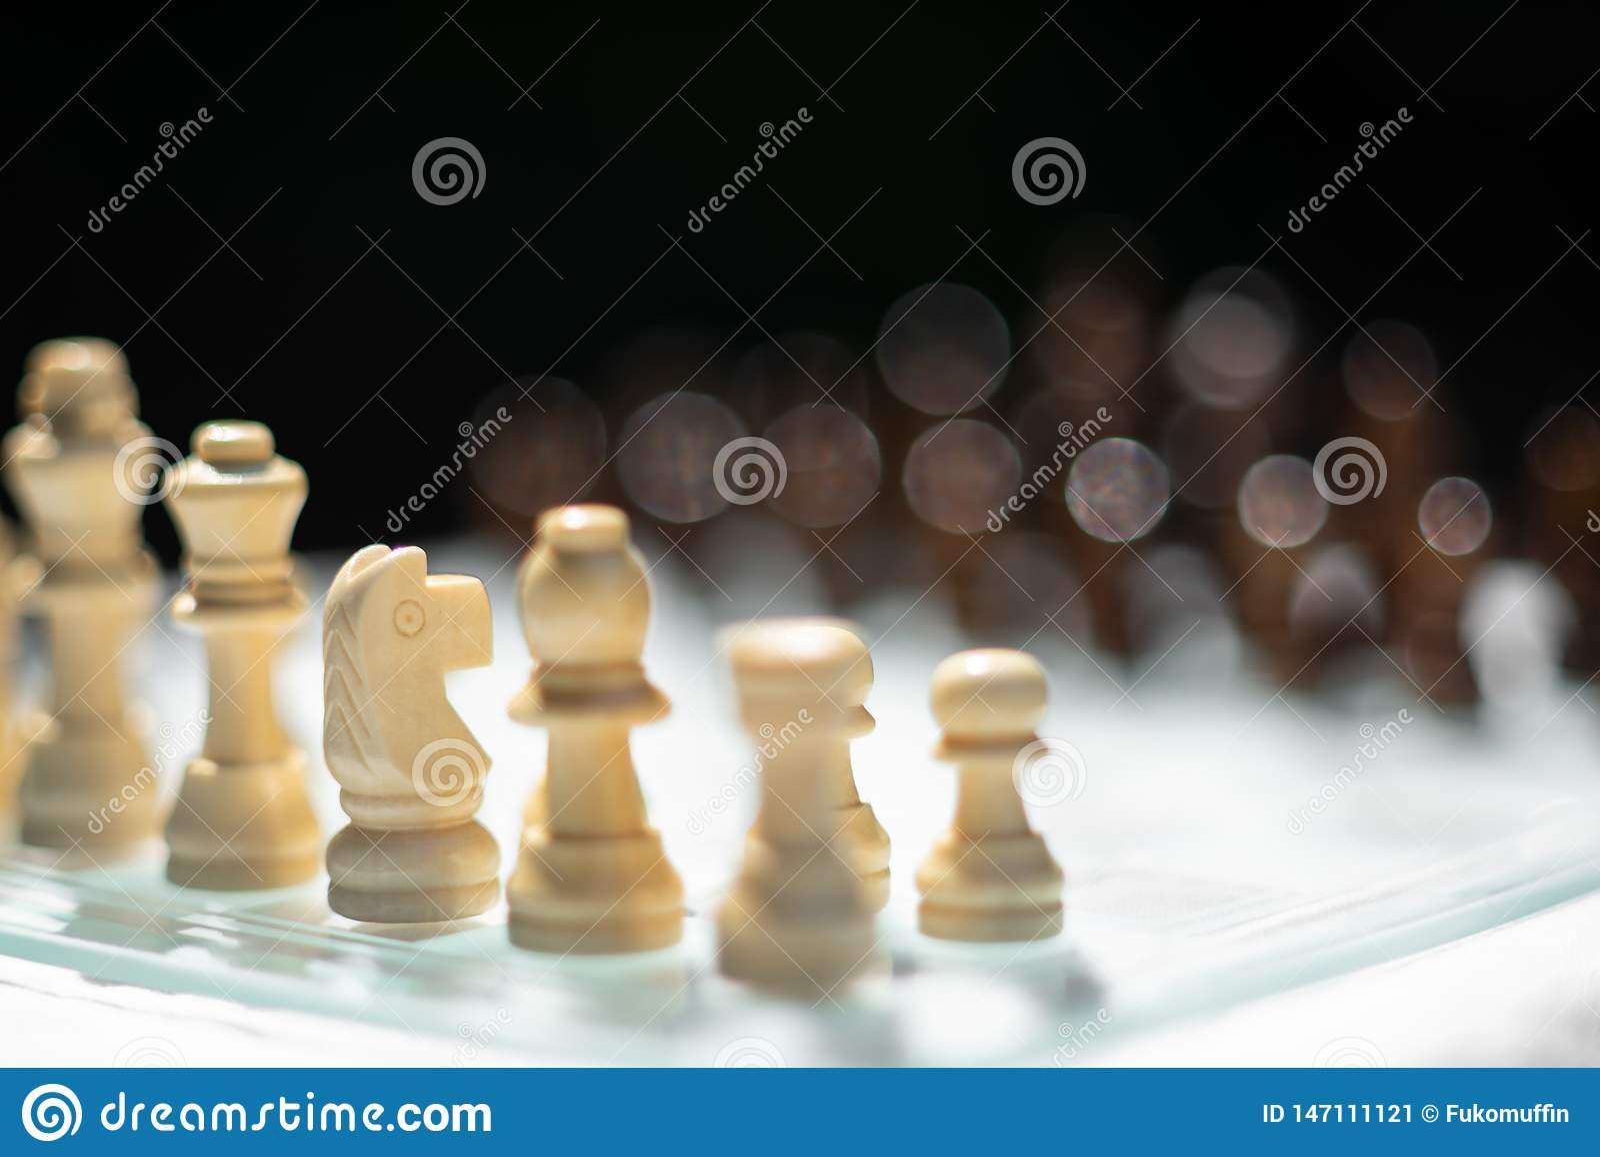 Jogo de xadrez Um movimento matar Refira a estrat?gia empresarial e o conceito competitivo